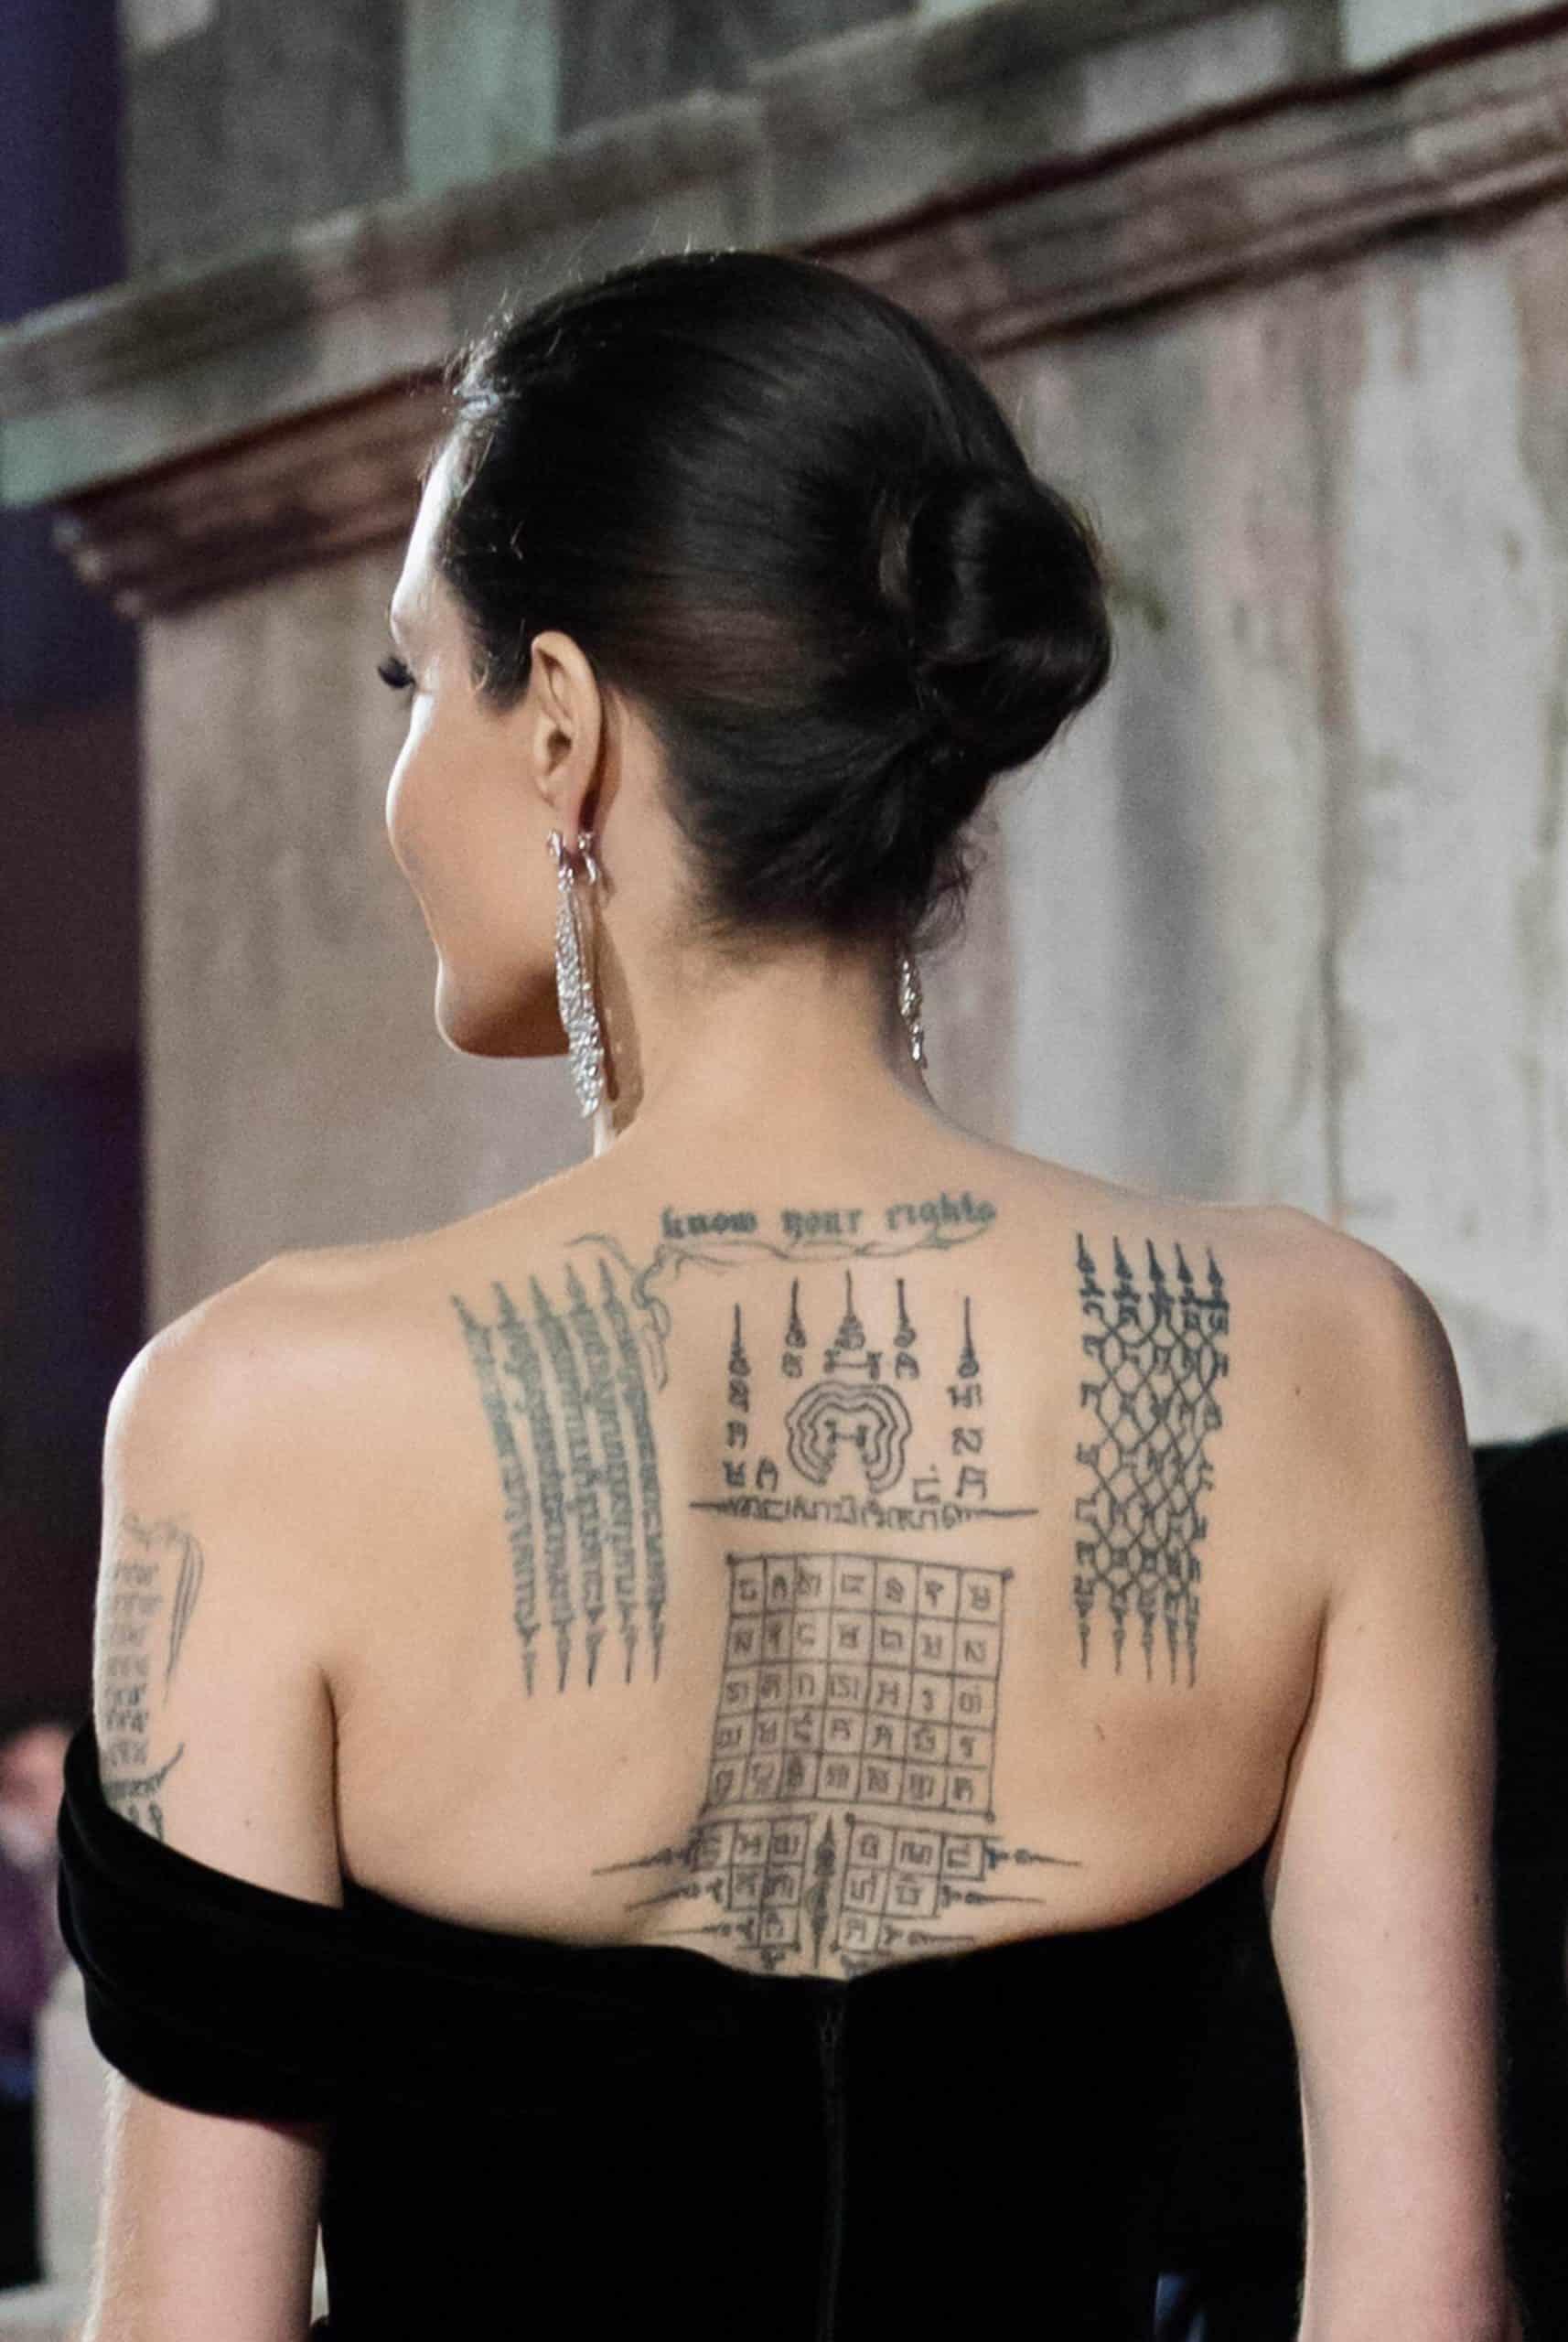 angelina jolie yant vihan pha chad sada tattoo